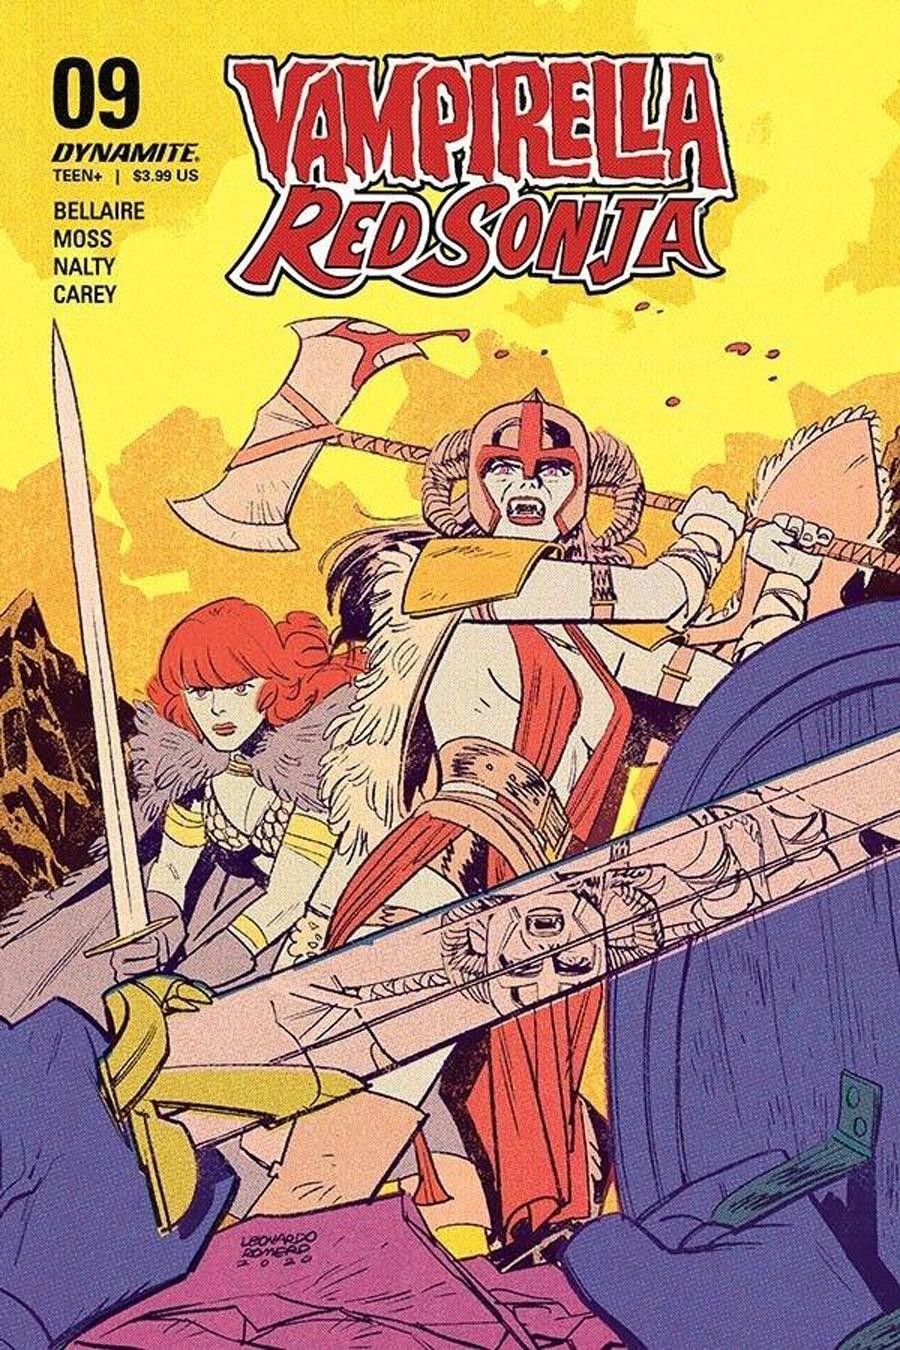 Vampirella Red Sonja #10 Cover C Variant Leonardo Romero & Jordie Bellaire Cover